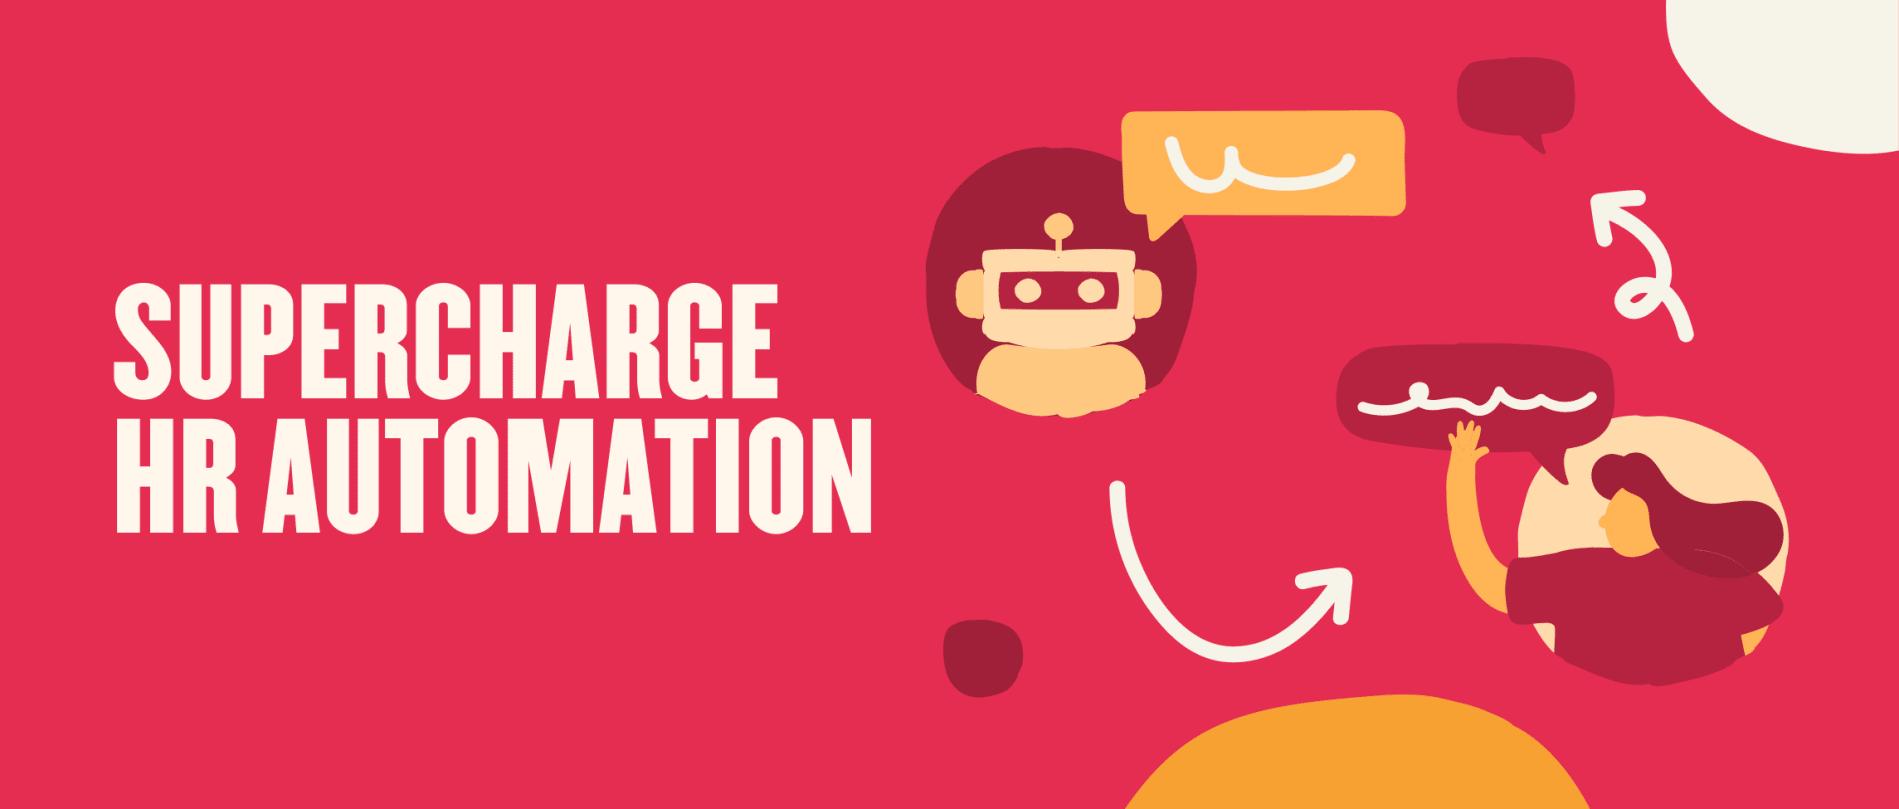 Supercharge HR automation